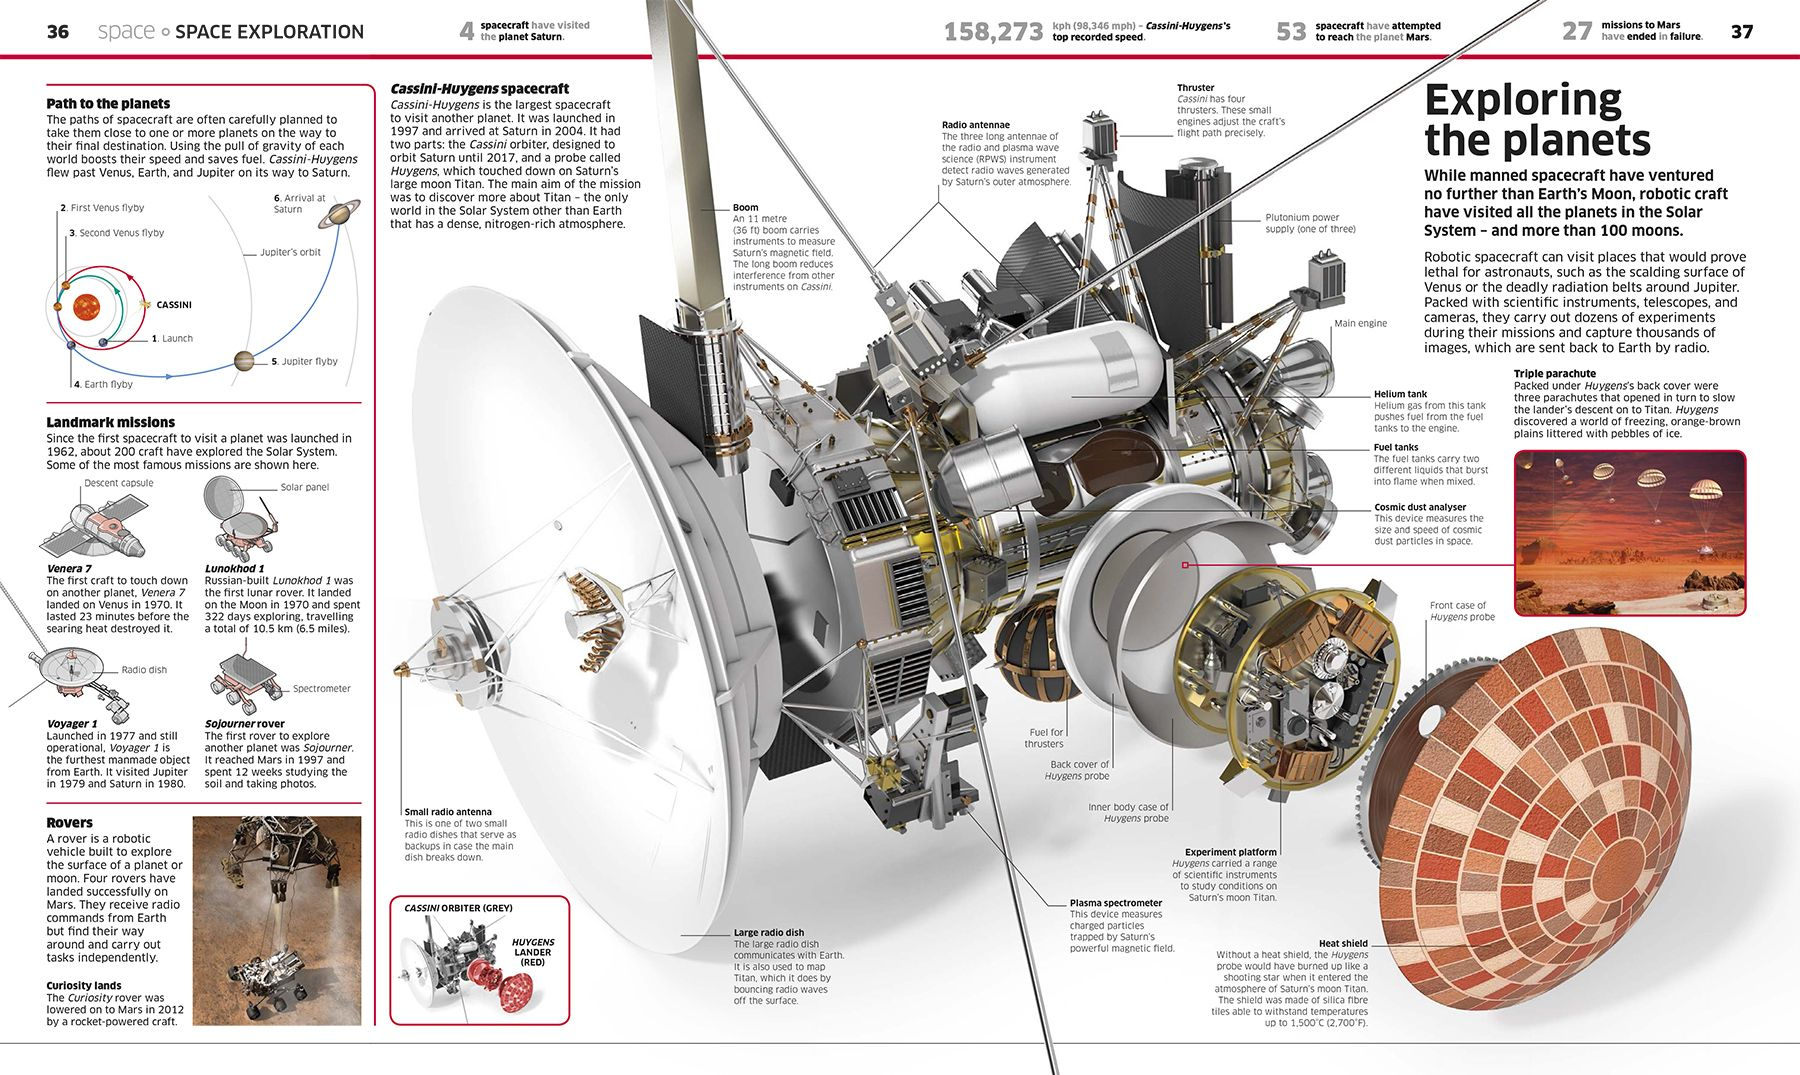 Dorling Kindersley Space Exploration Illustrations